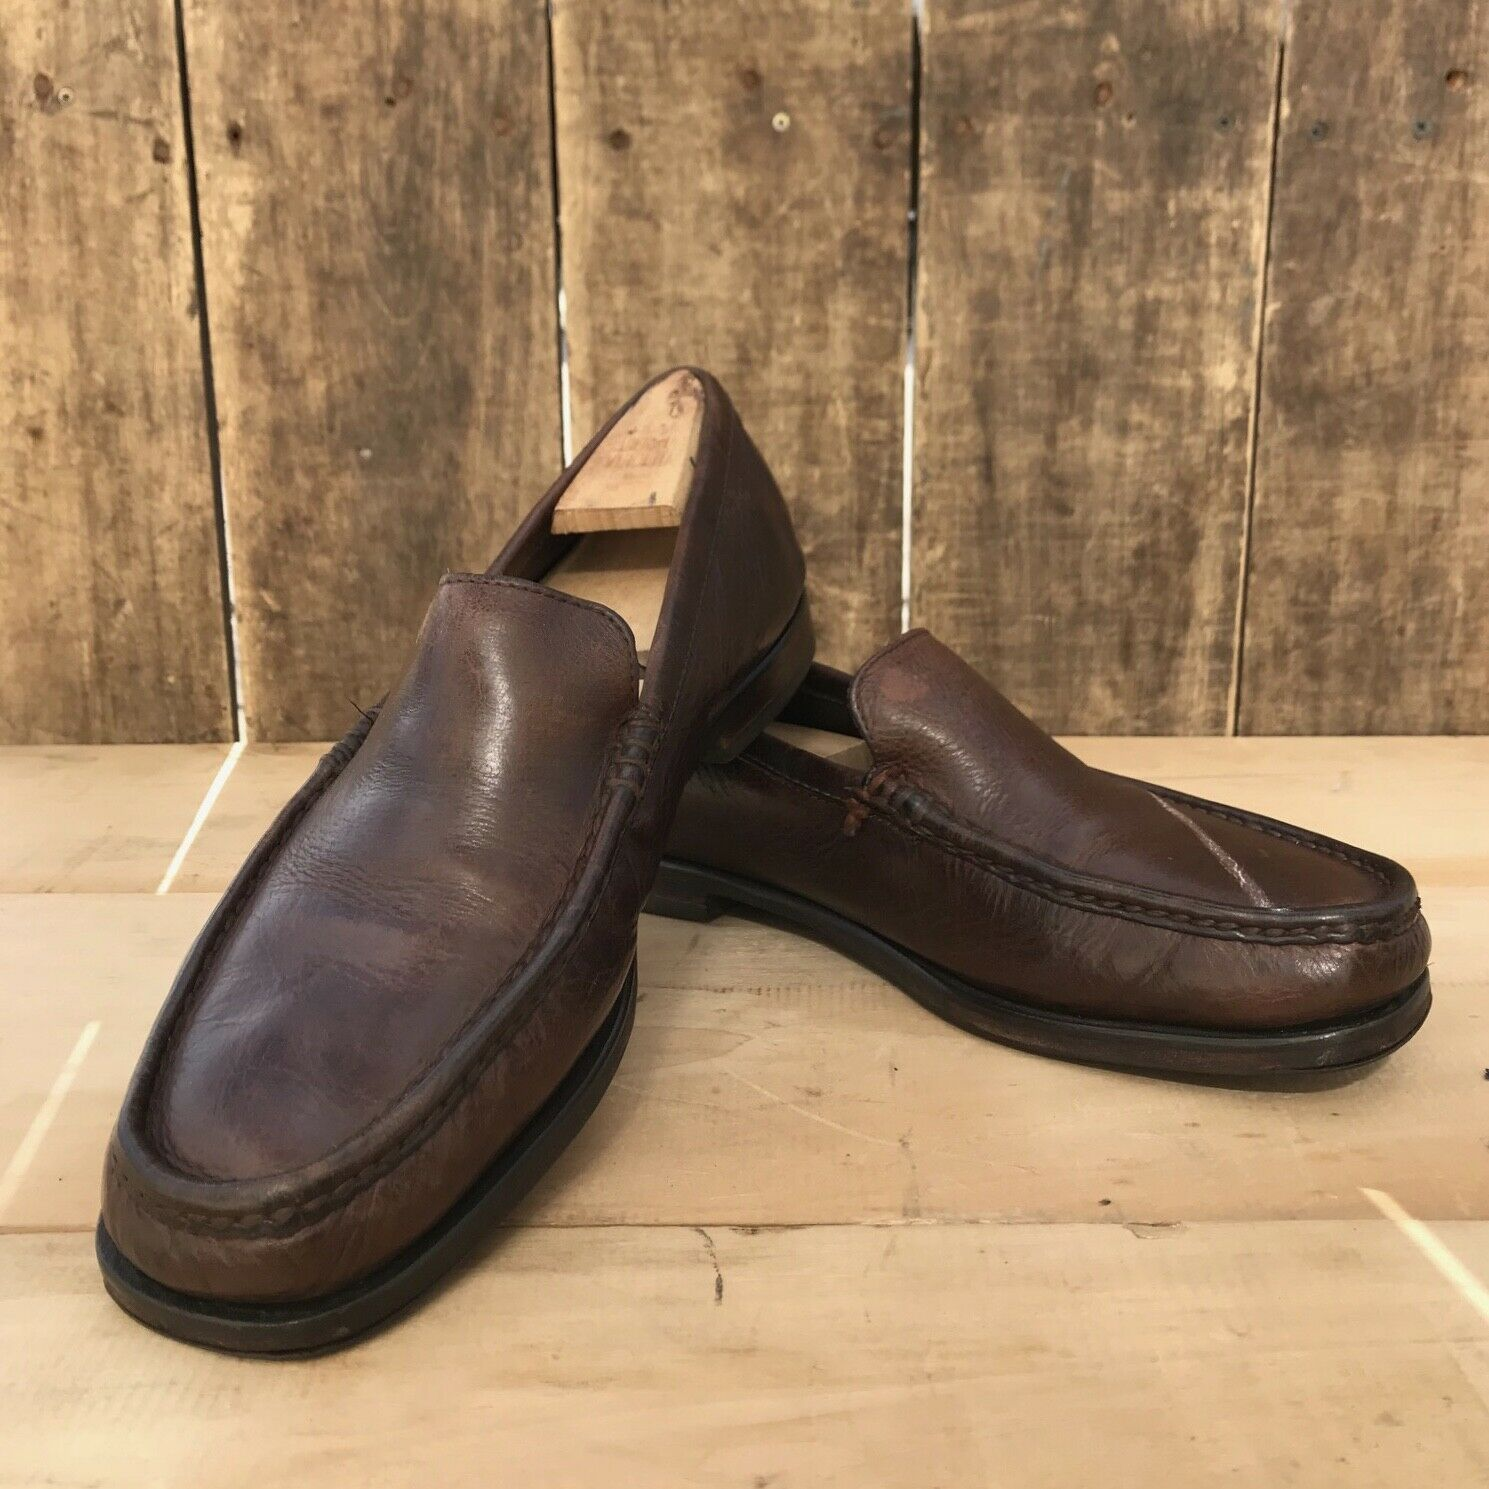 CHATHAM - chaussure mocassin bateau en cuir - pointure 41